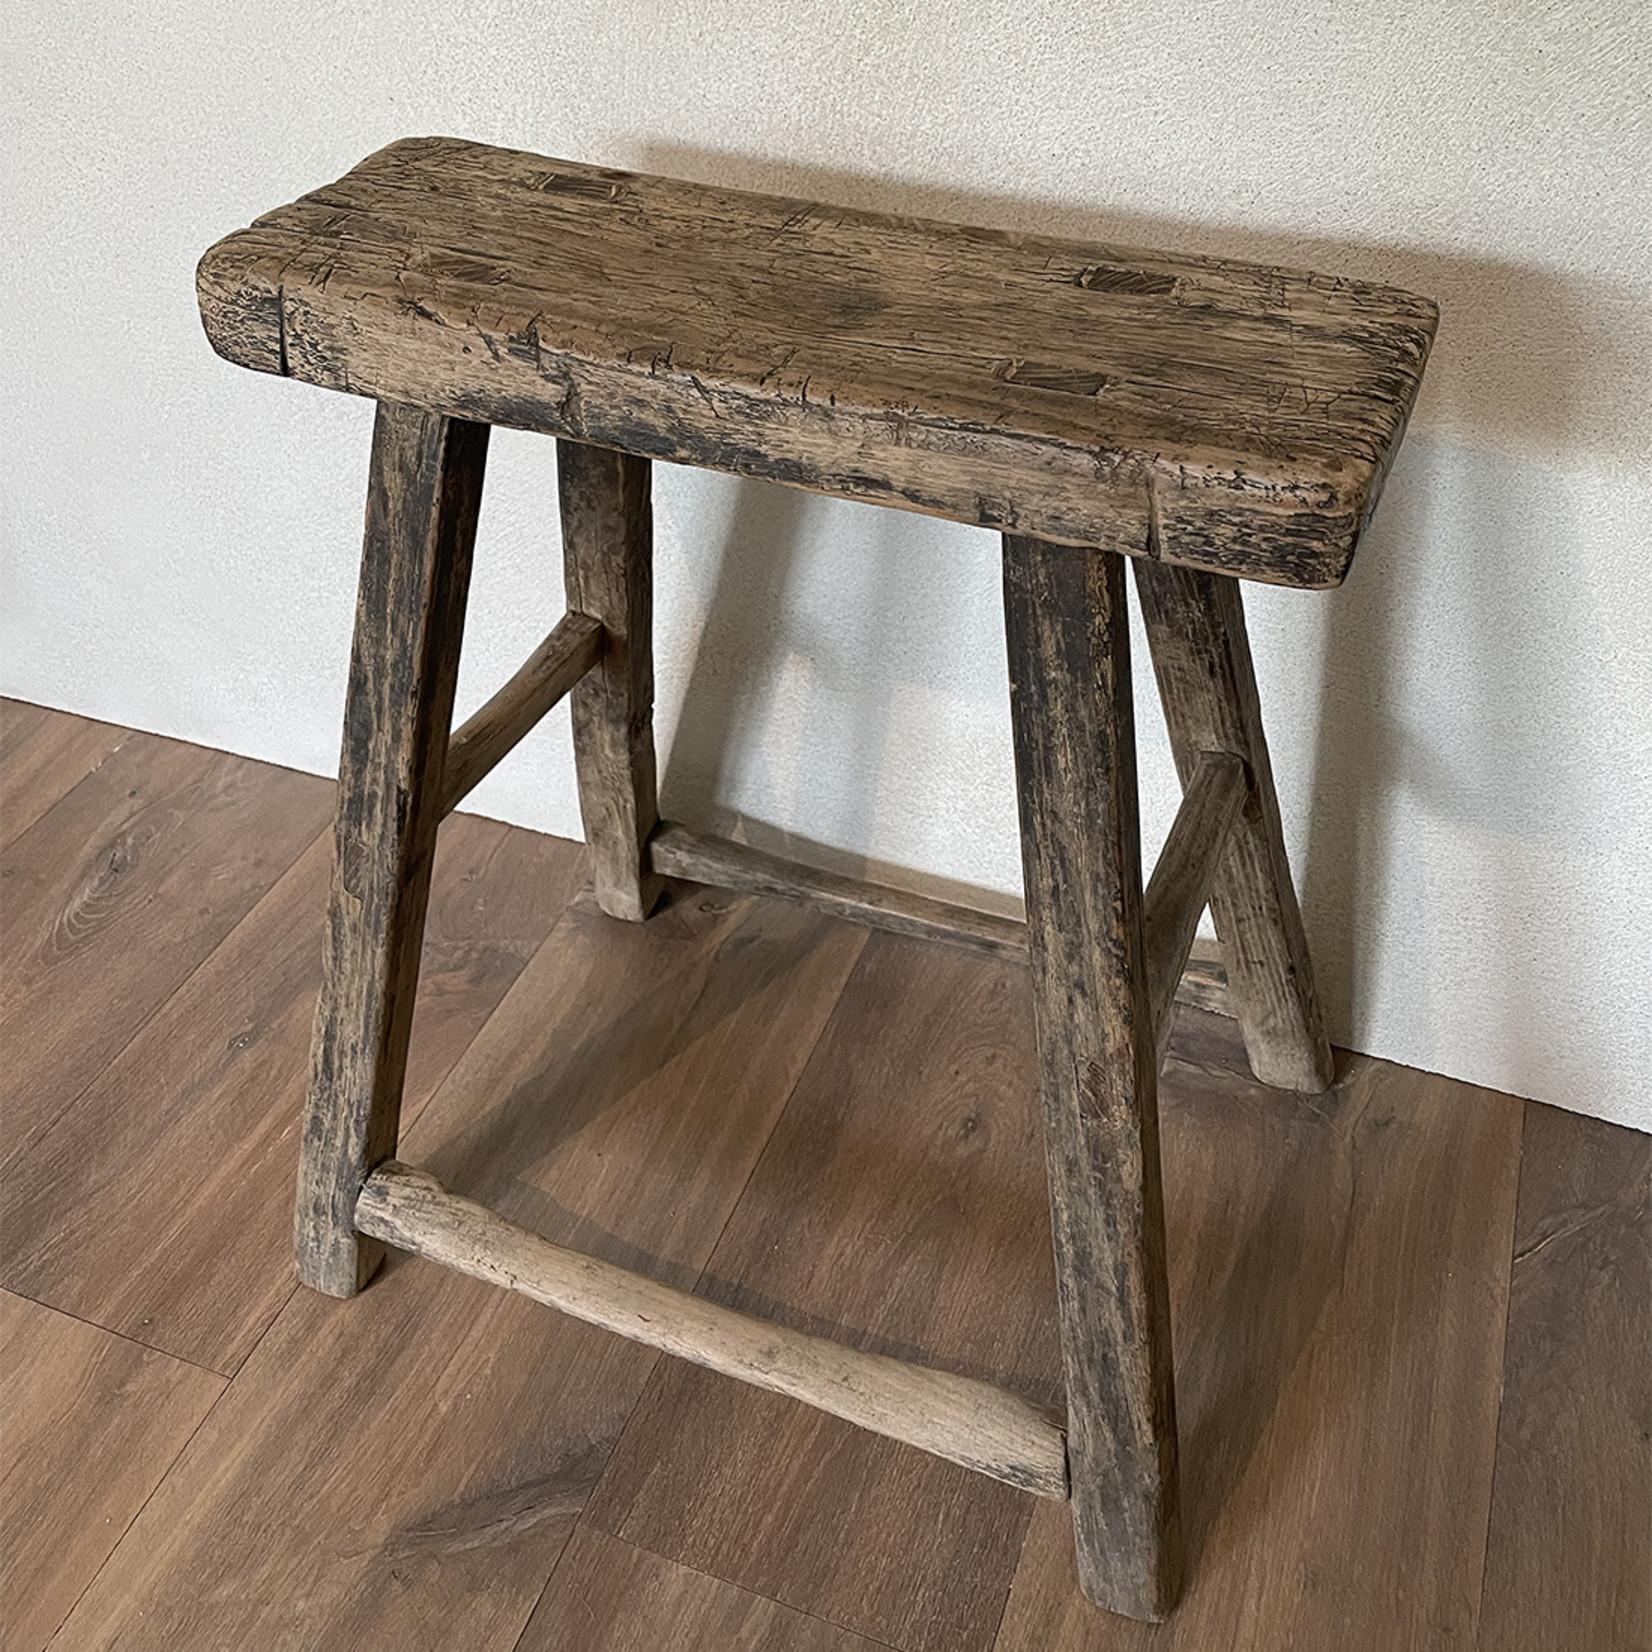 Olm stool °4